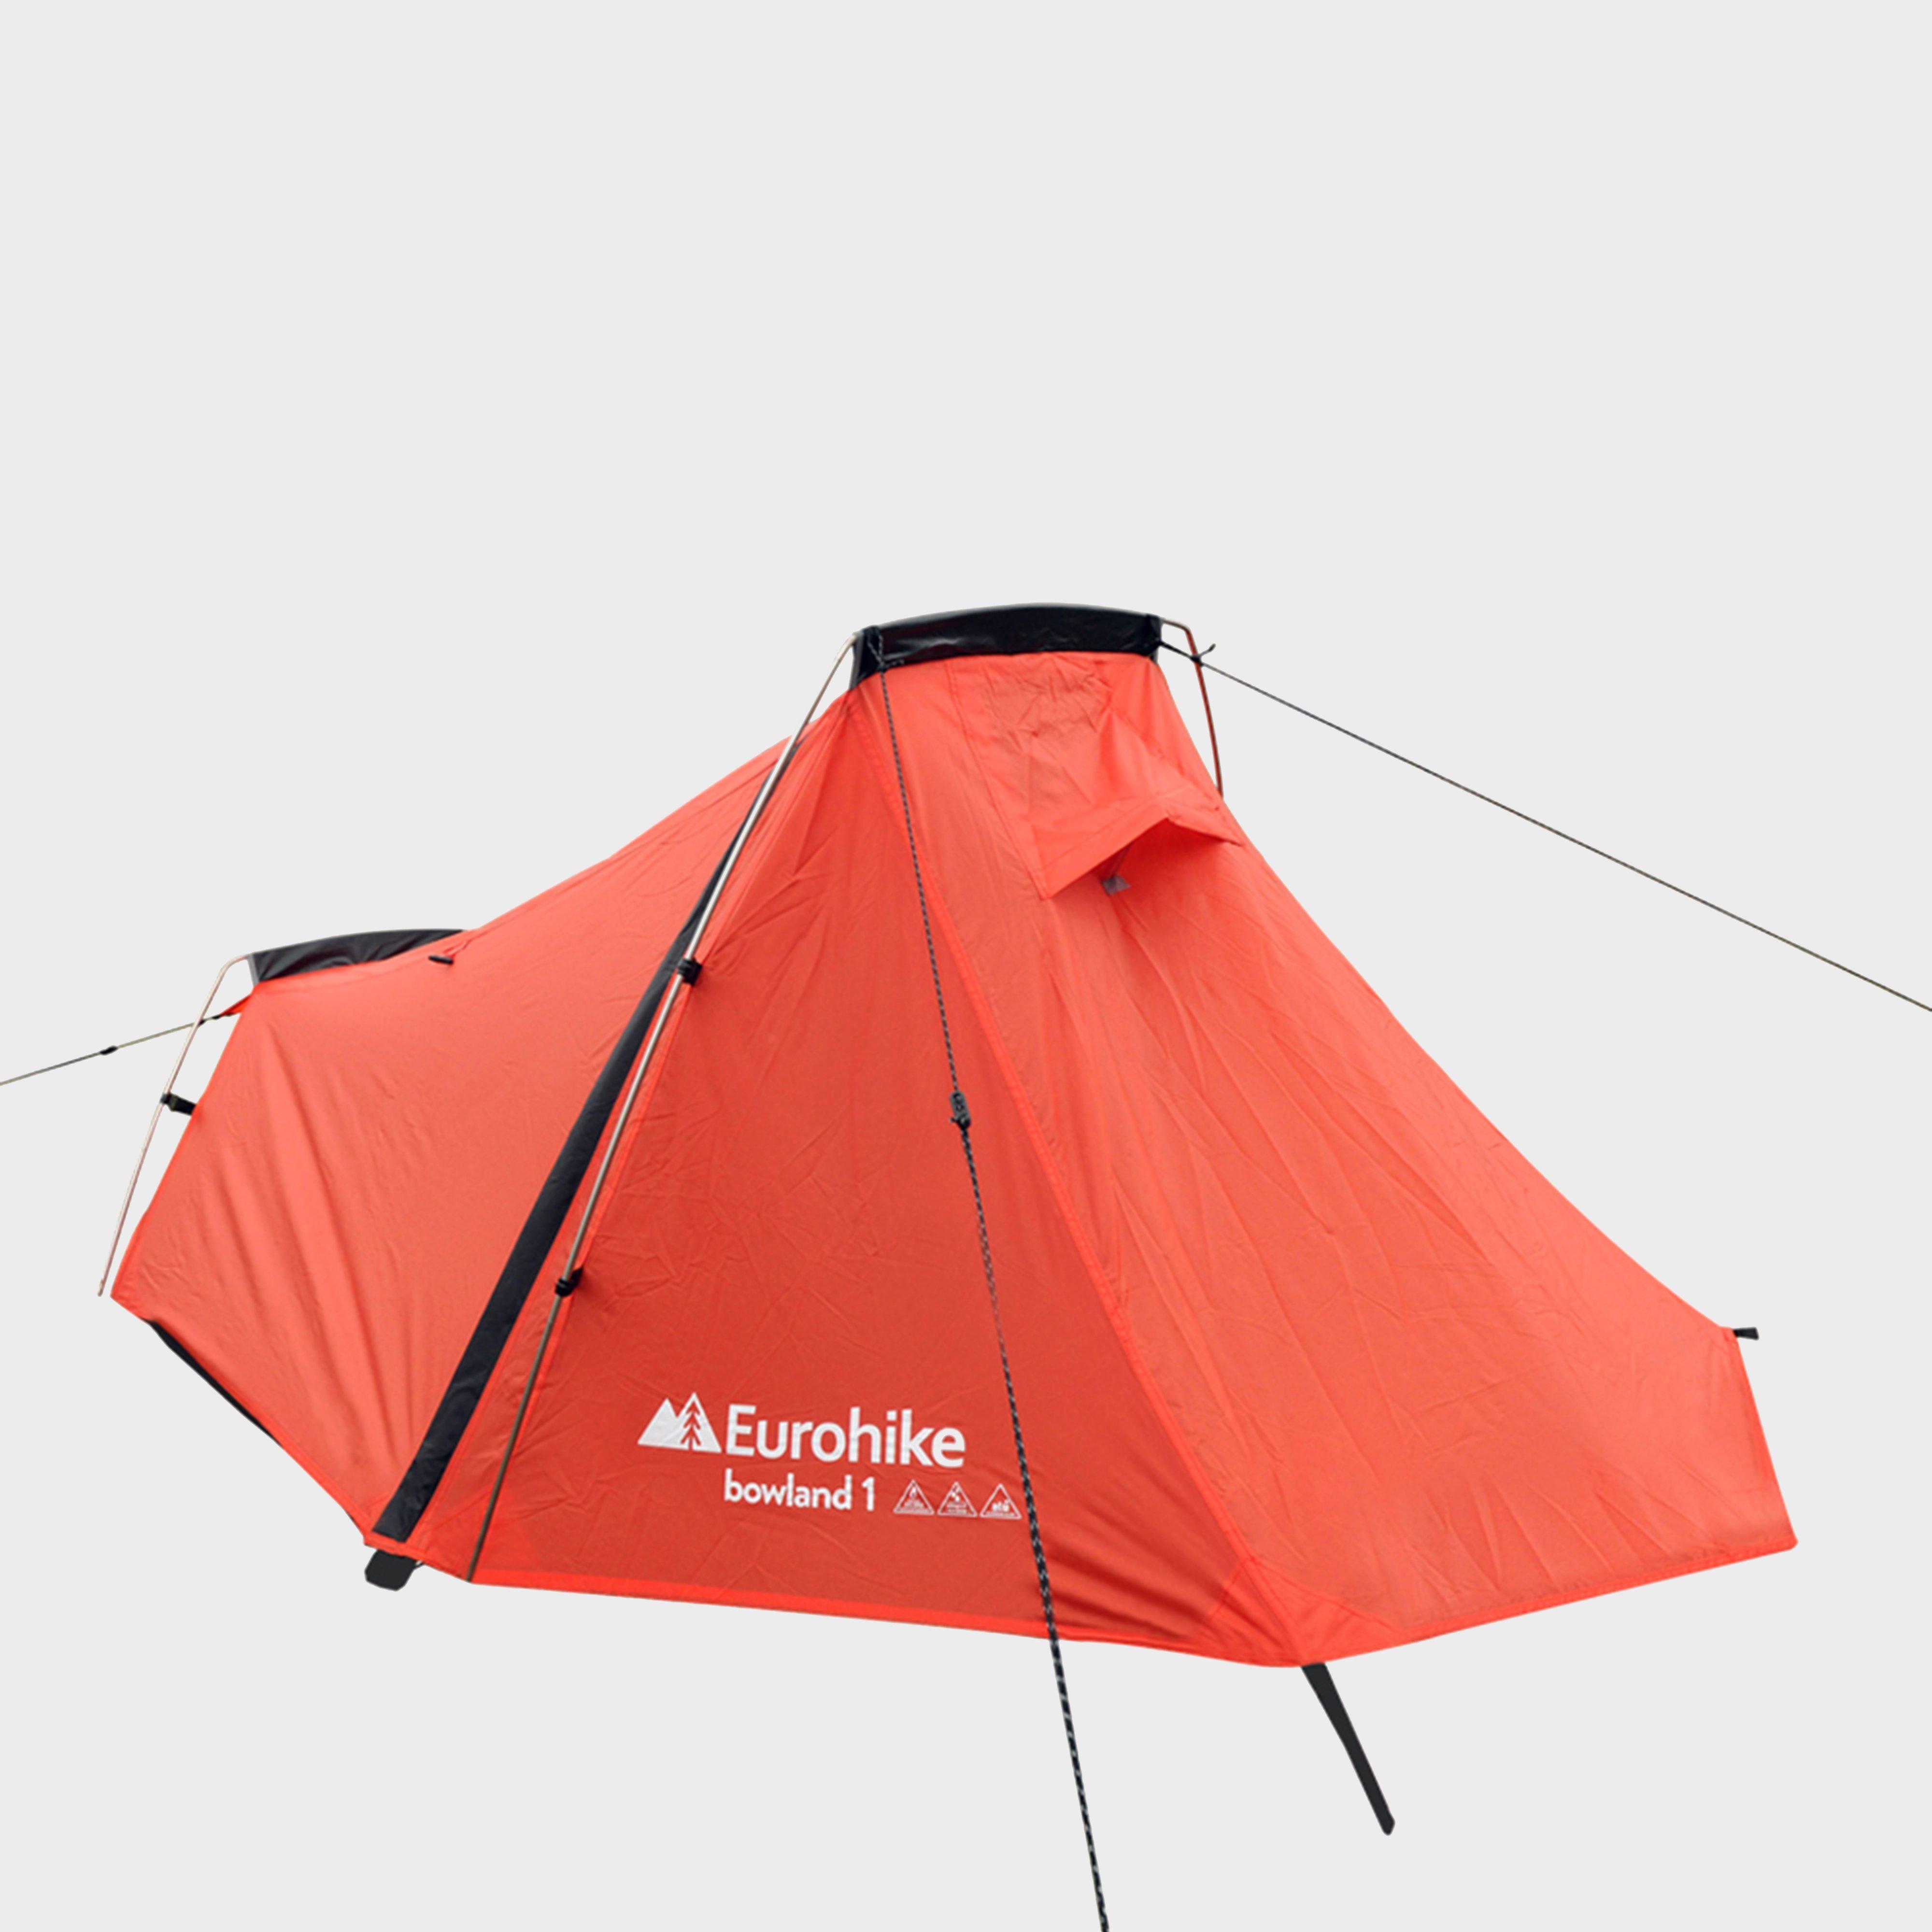 Eurohike Bowland 1 Tent